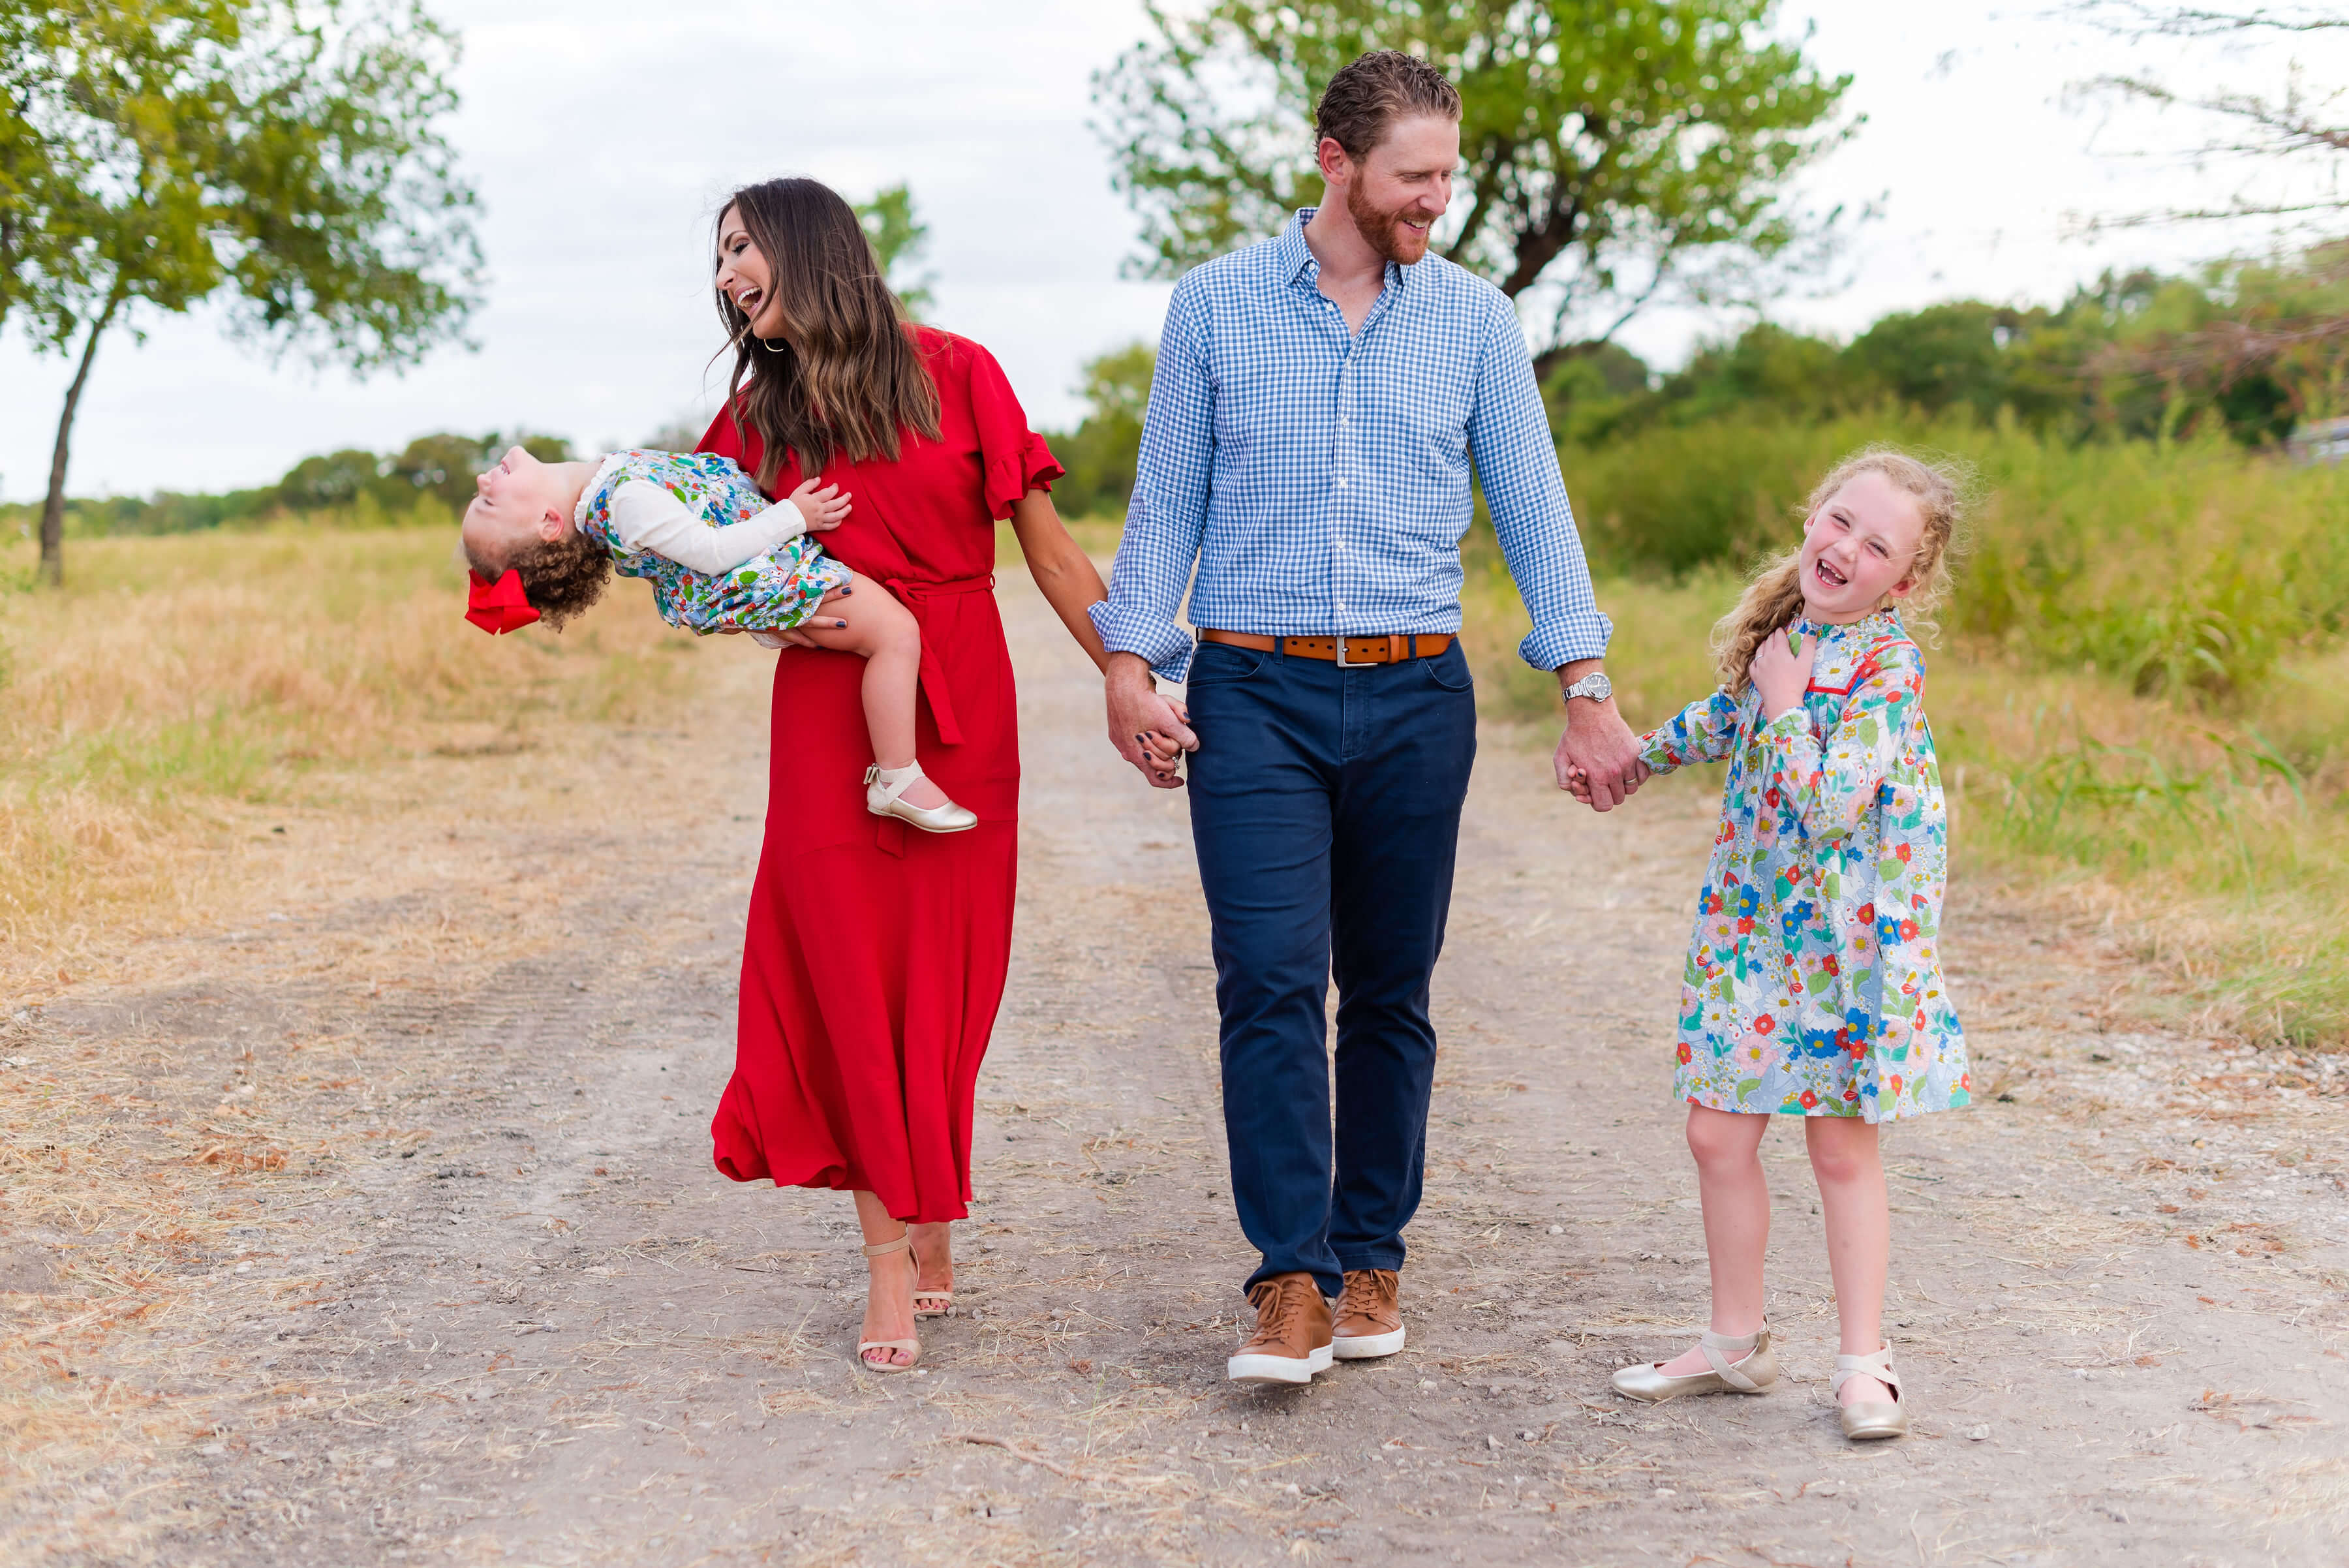 family of 4 | Fall family photo Ideas | Style Your Senses